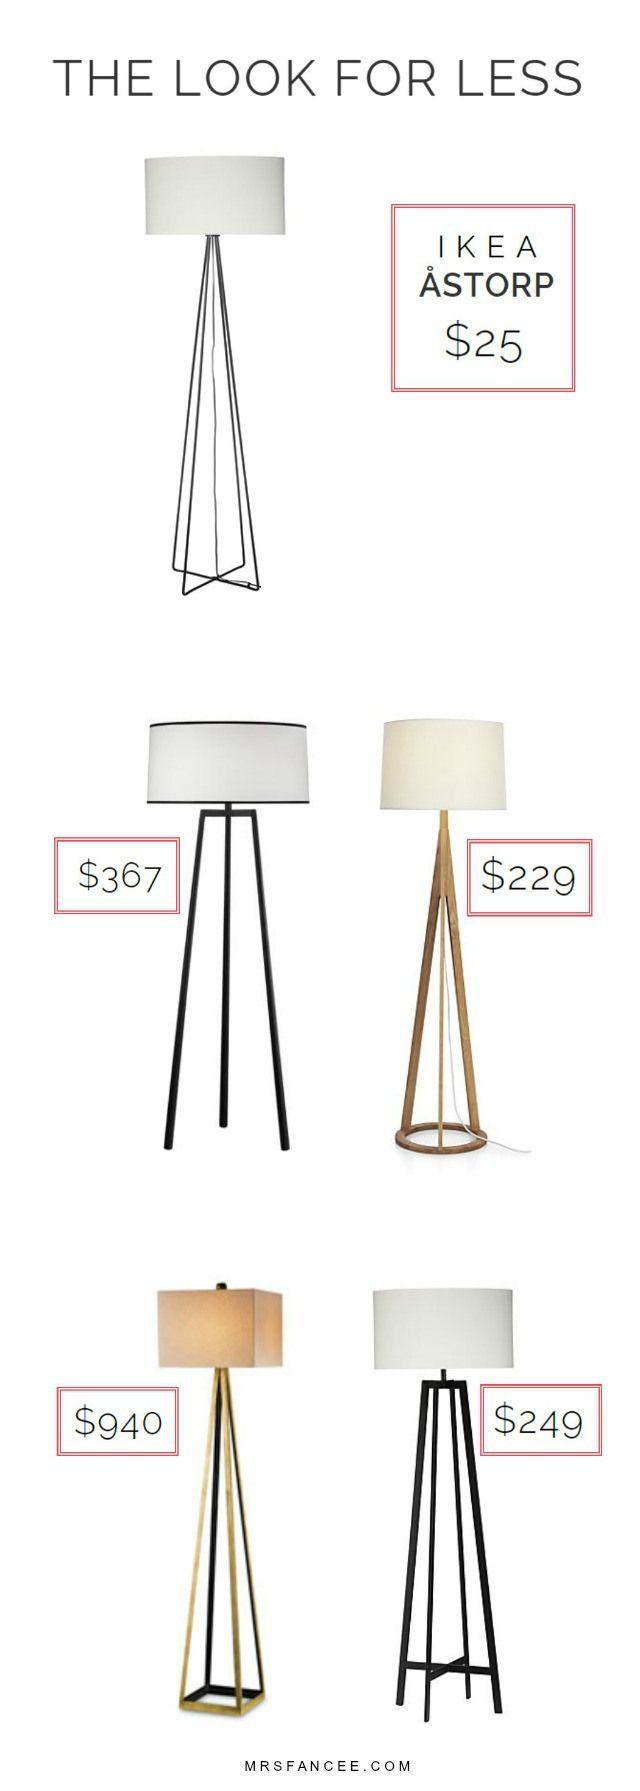 111 best Ikea Lamp images on Pinterest